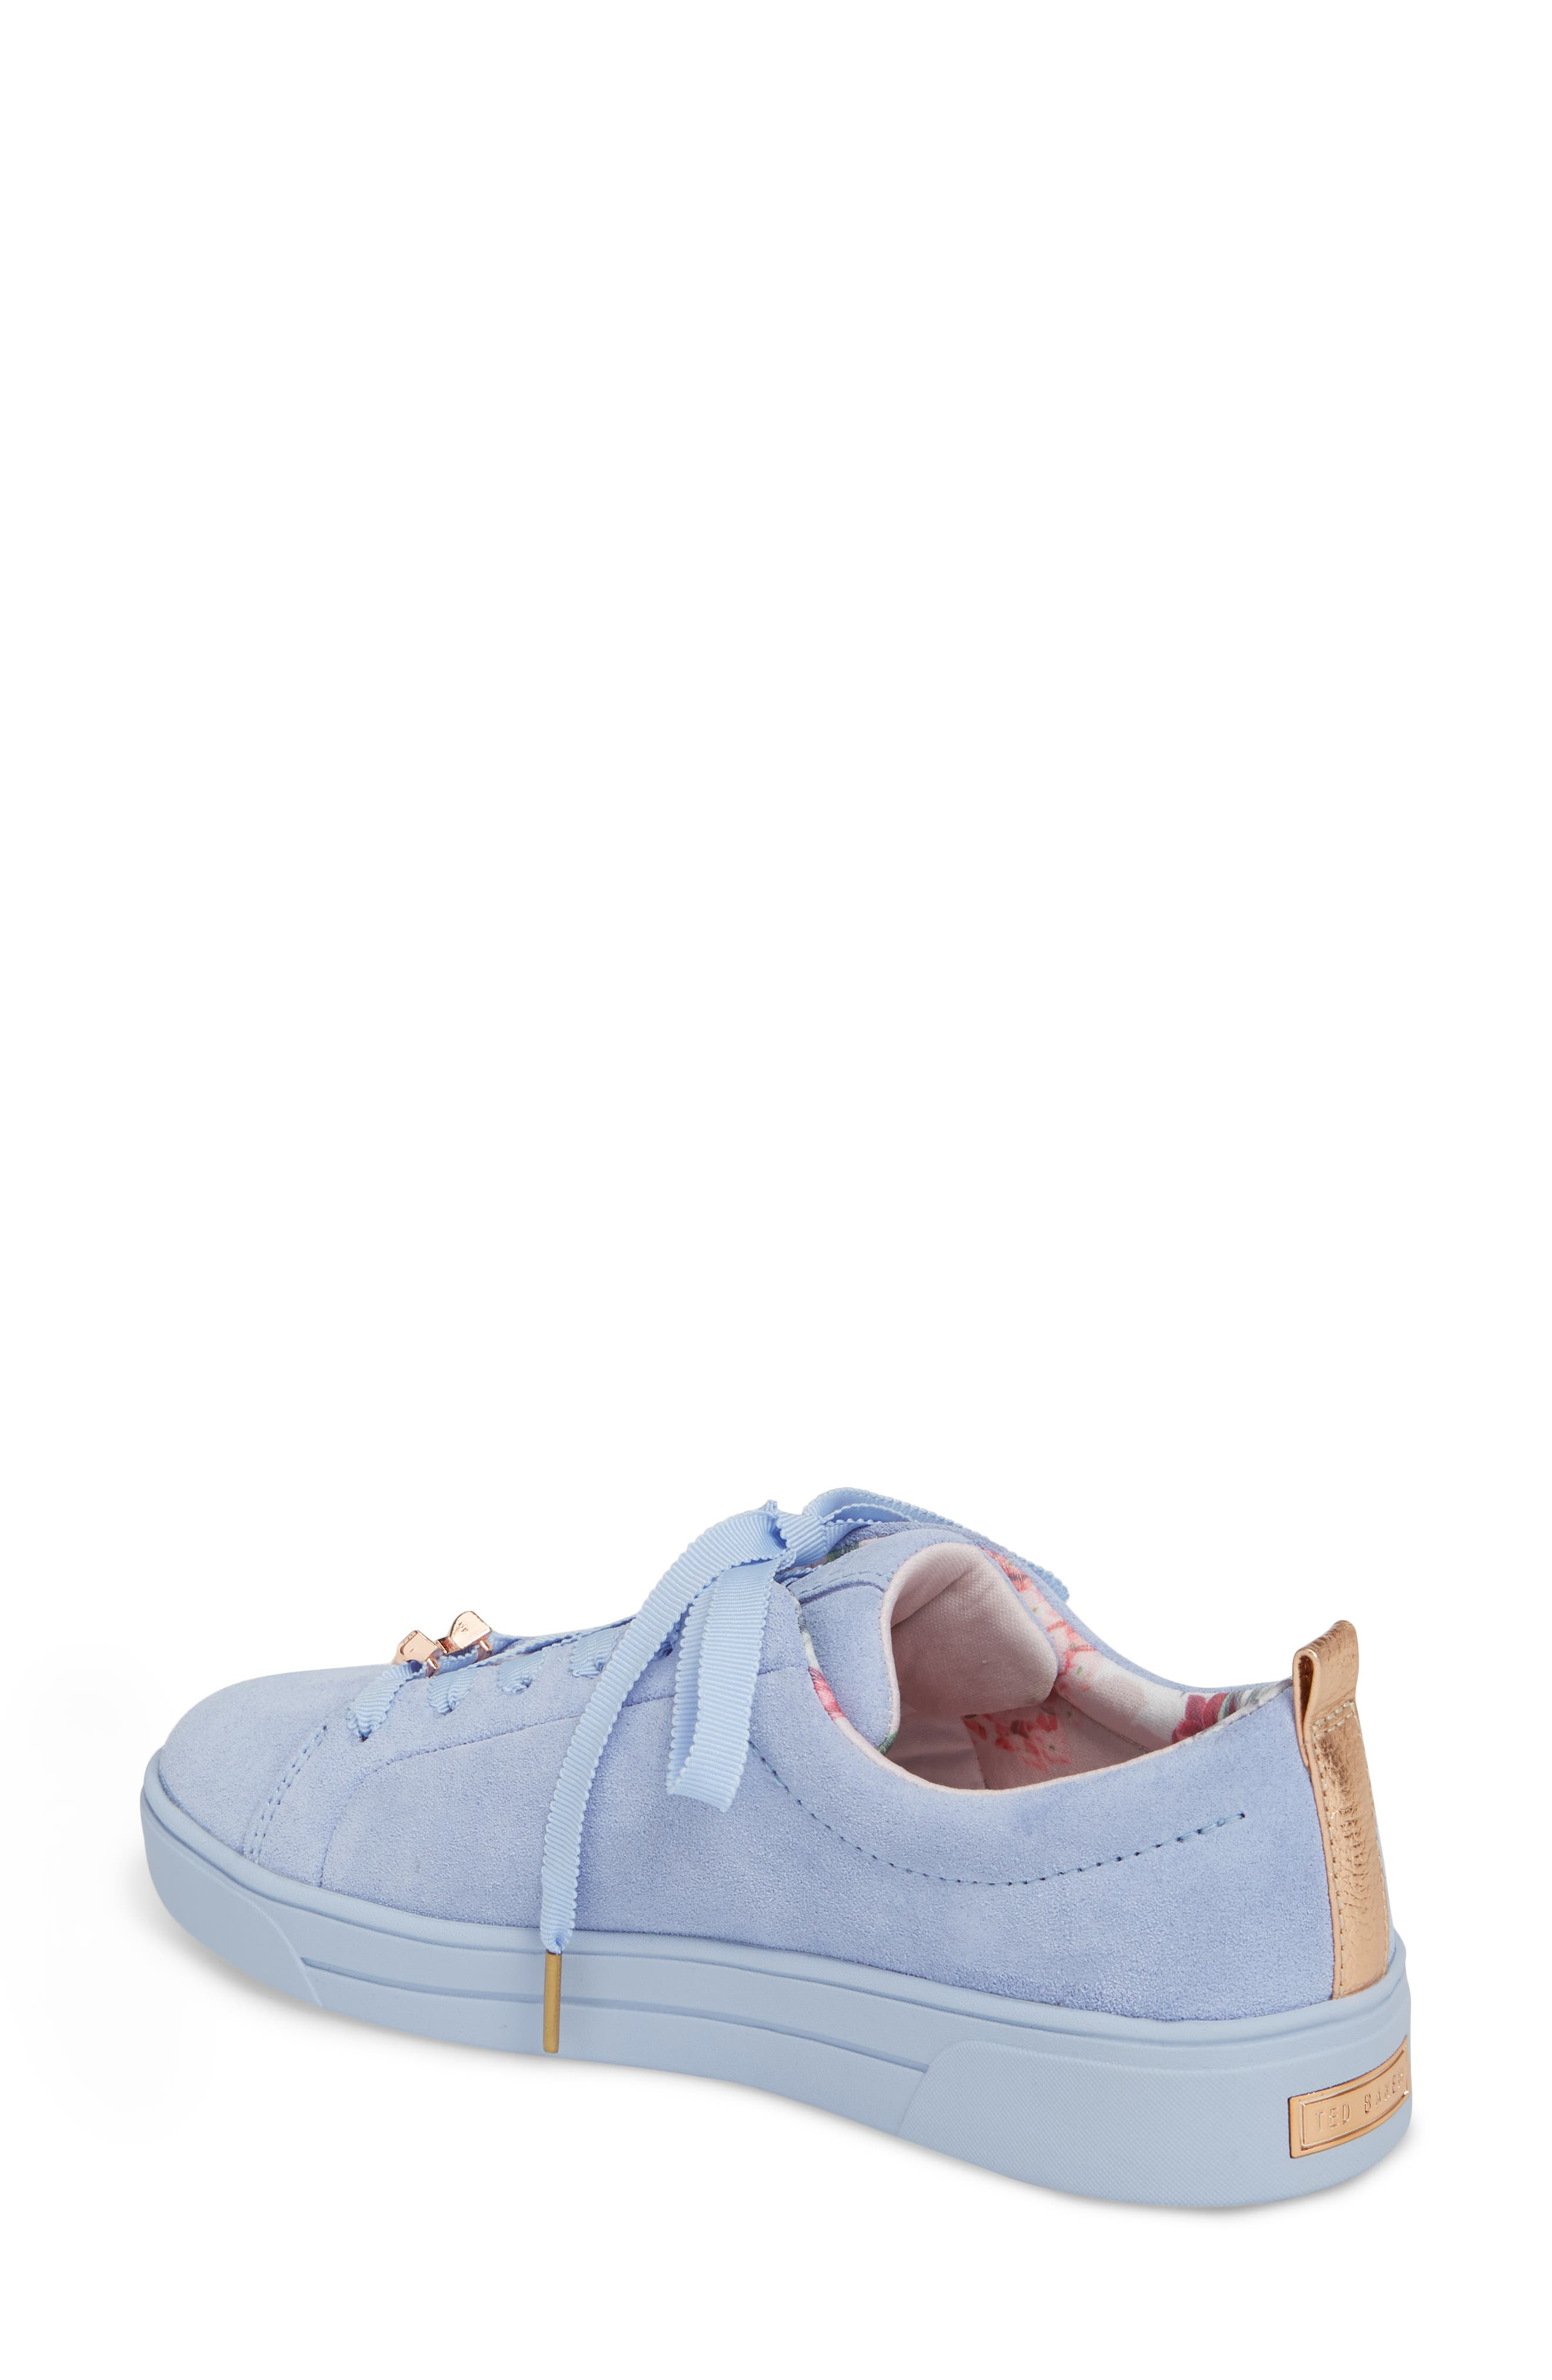 Kelleis Sneaker,                             Alternate thumbnail 2, color,                             Light Blue Suede